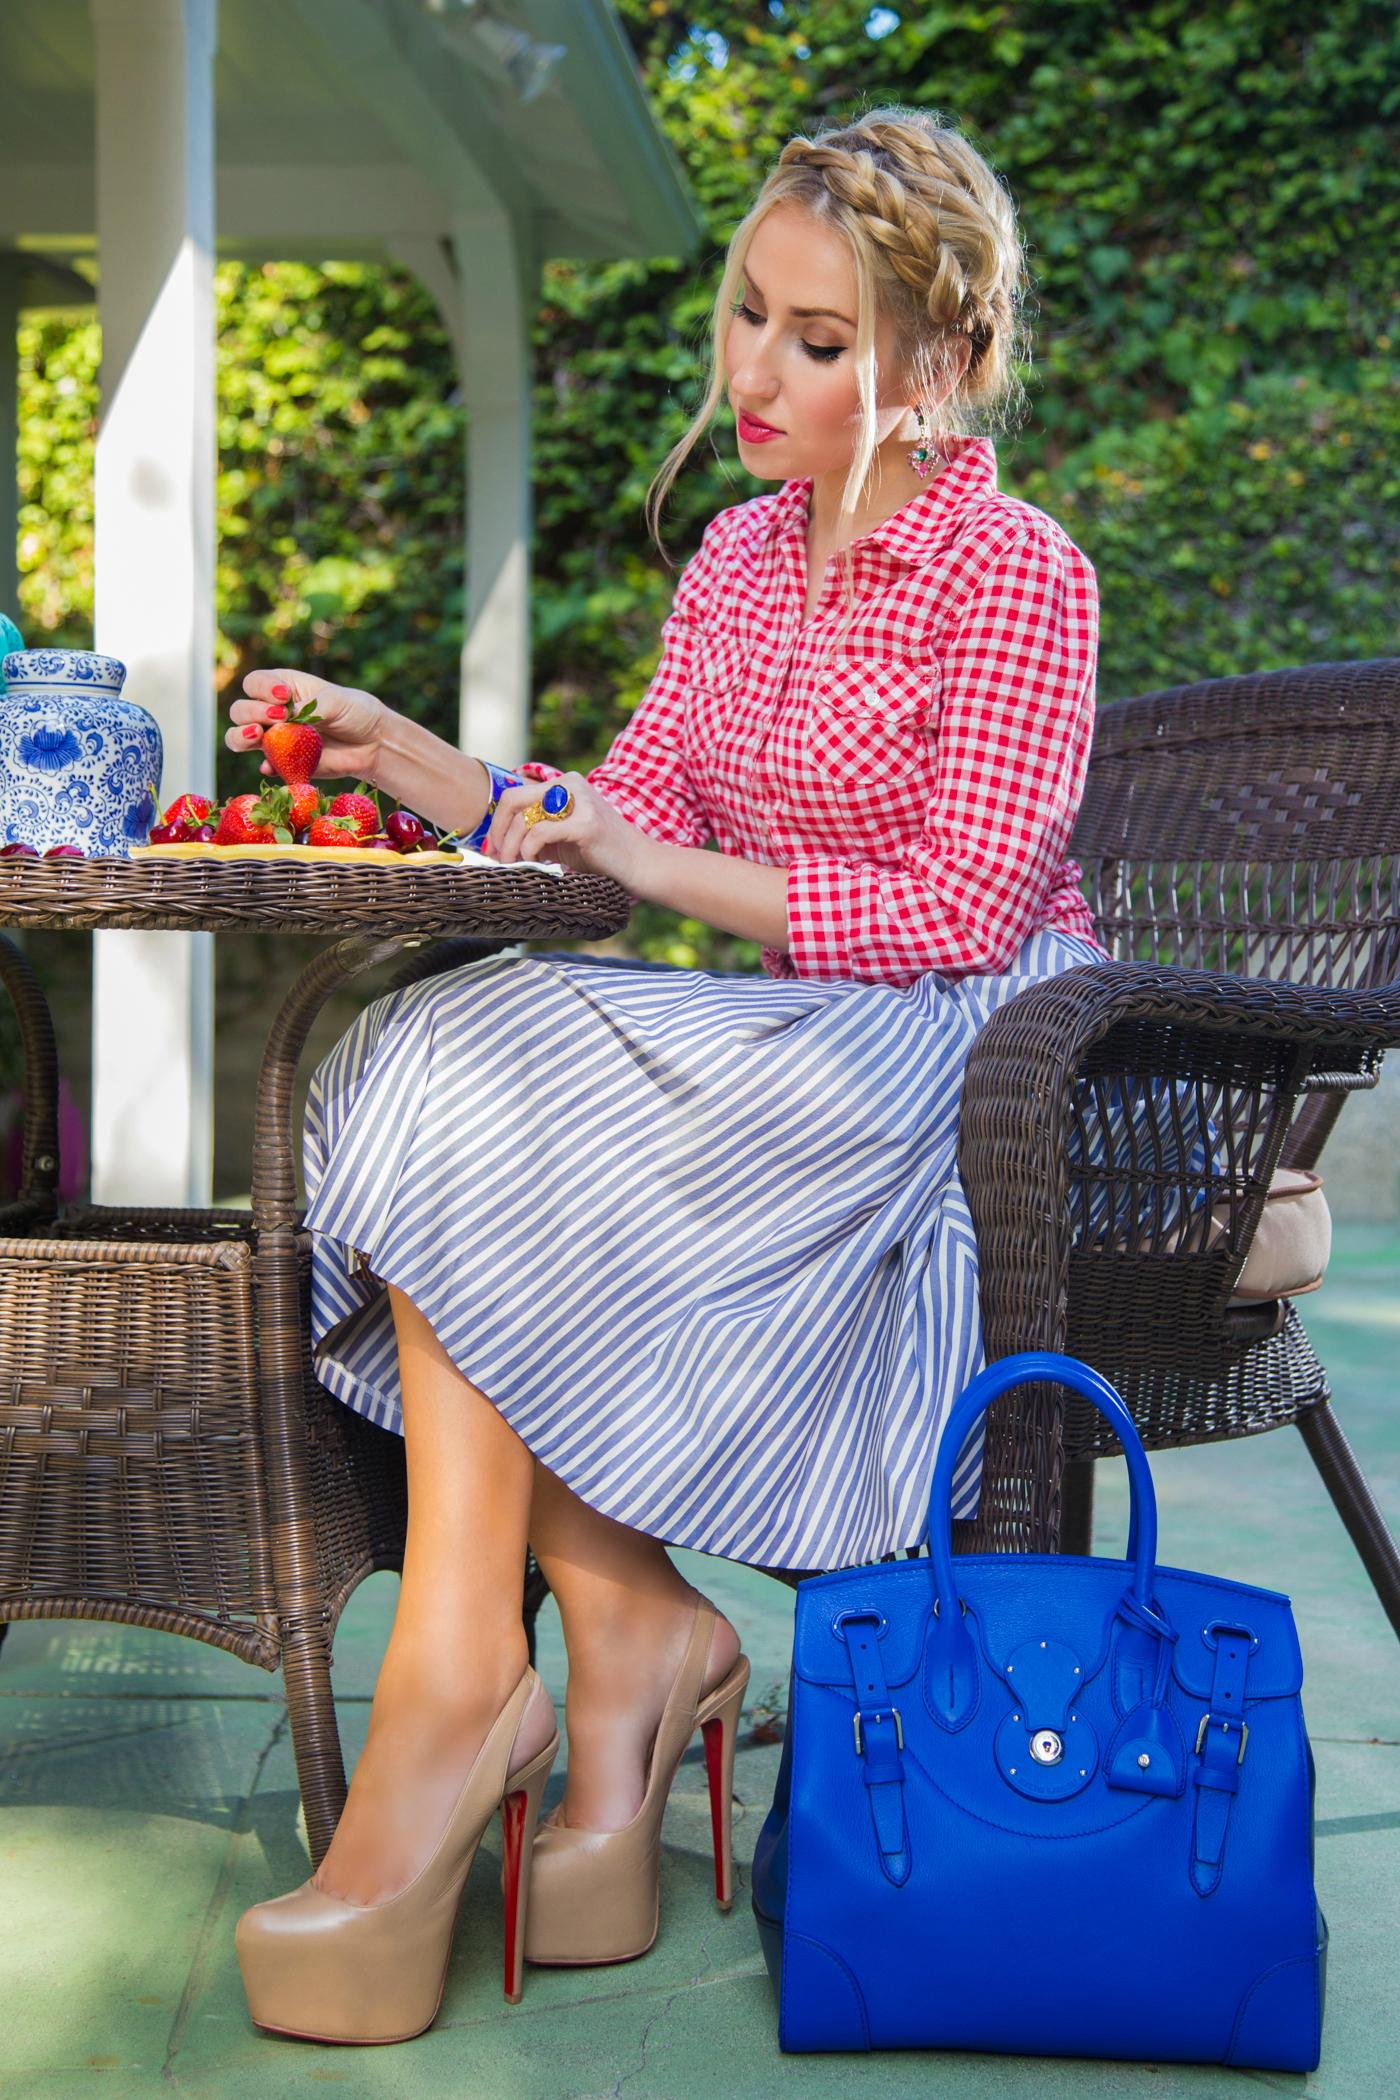 ralph lauren soft ricky bag,striped zara skirt,red plaid shirt,old navy shirt,christian louboutin shoes,hermes bracelet